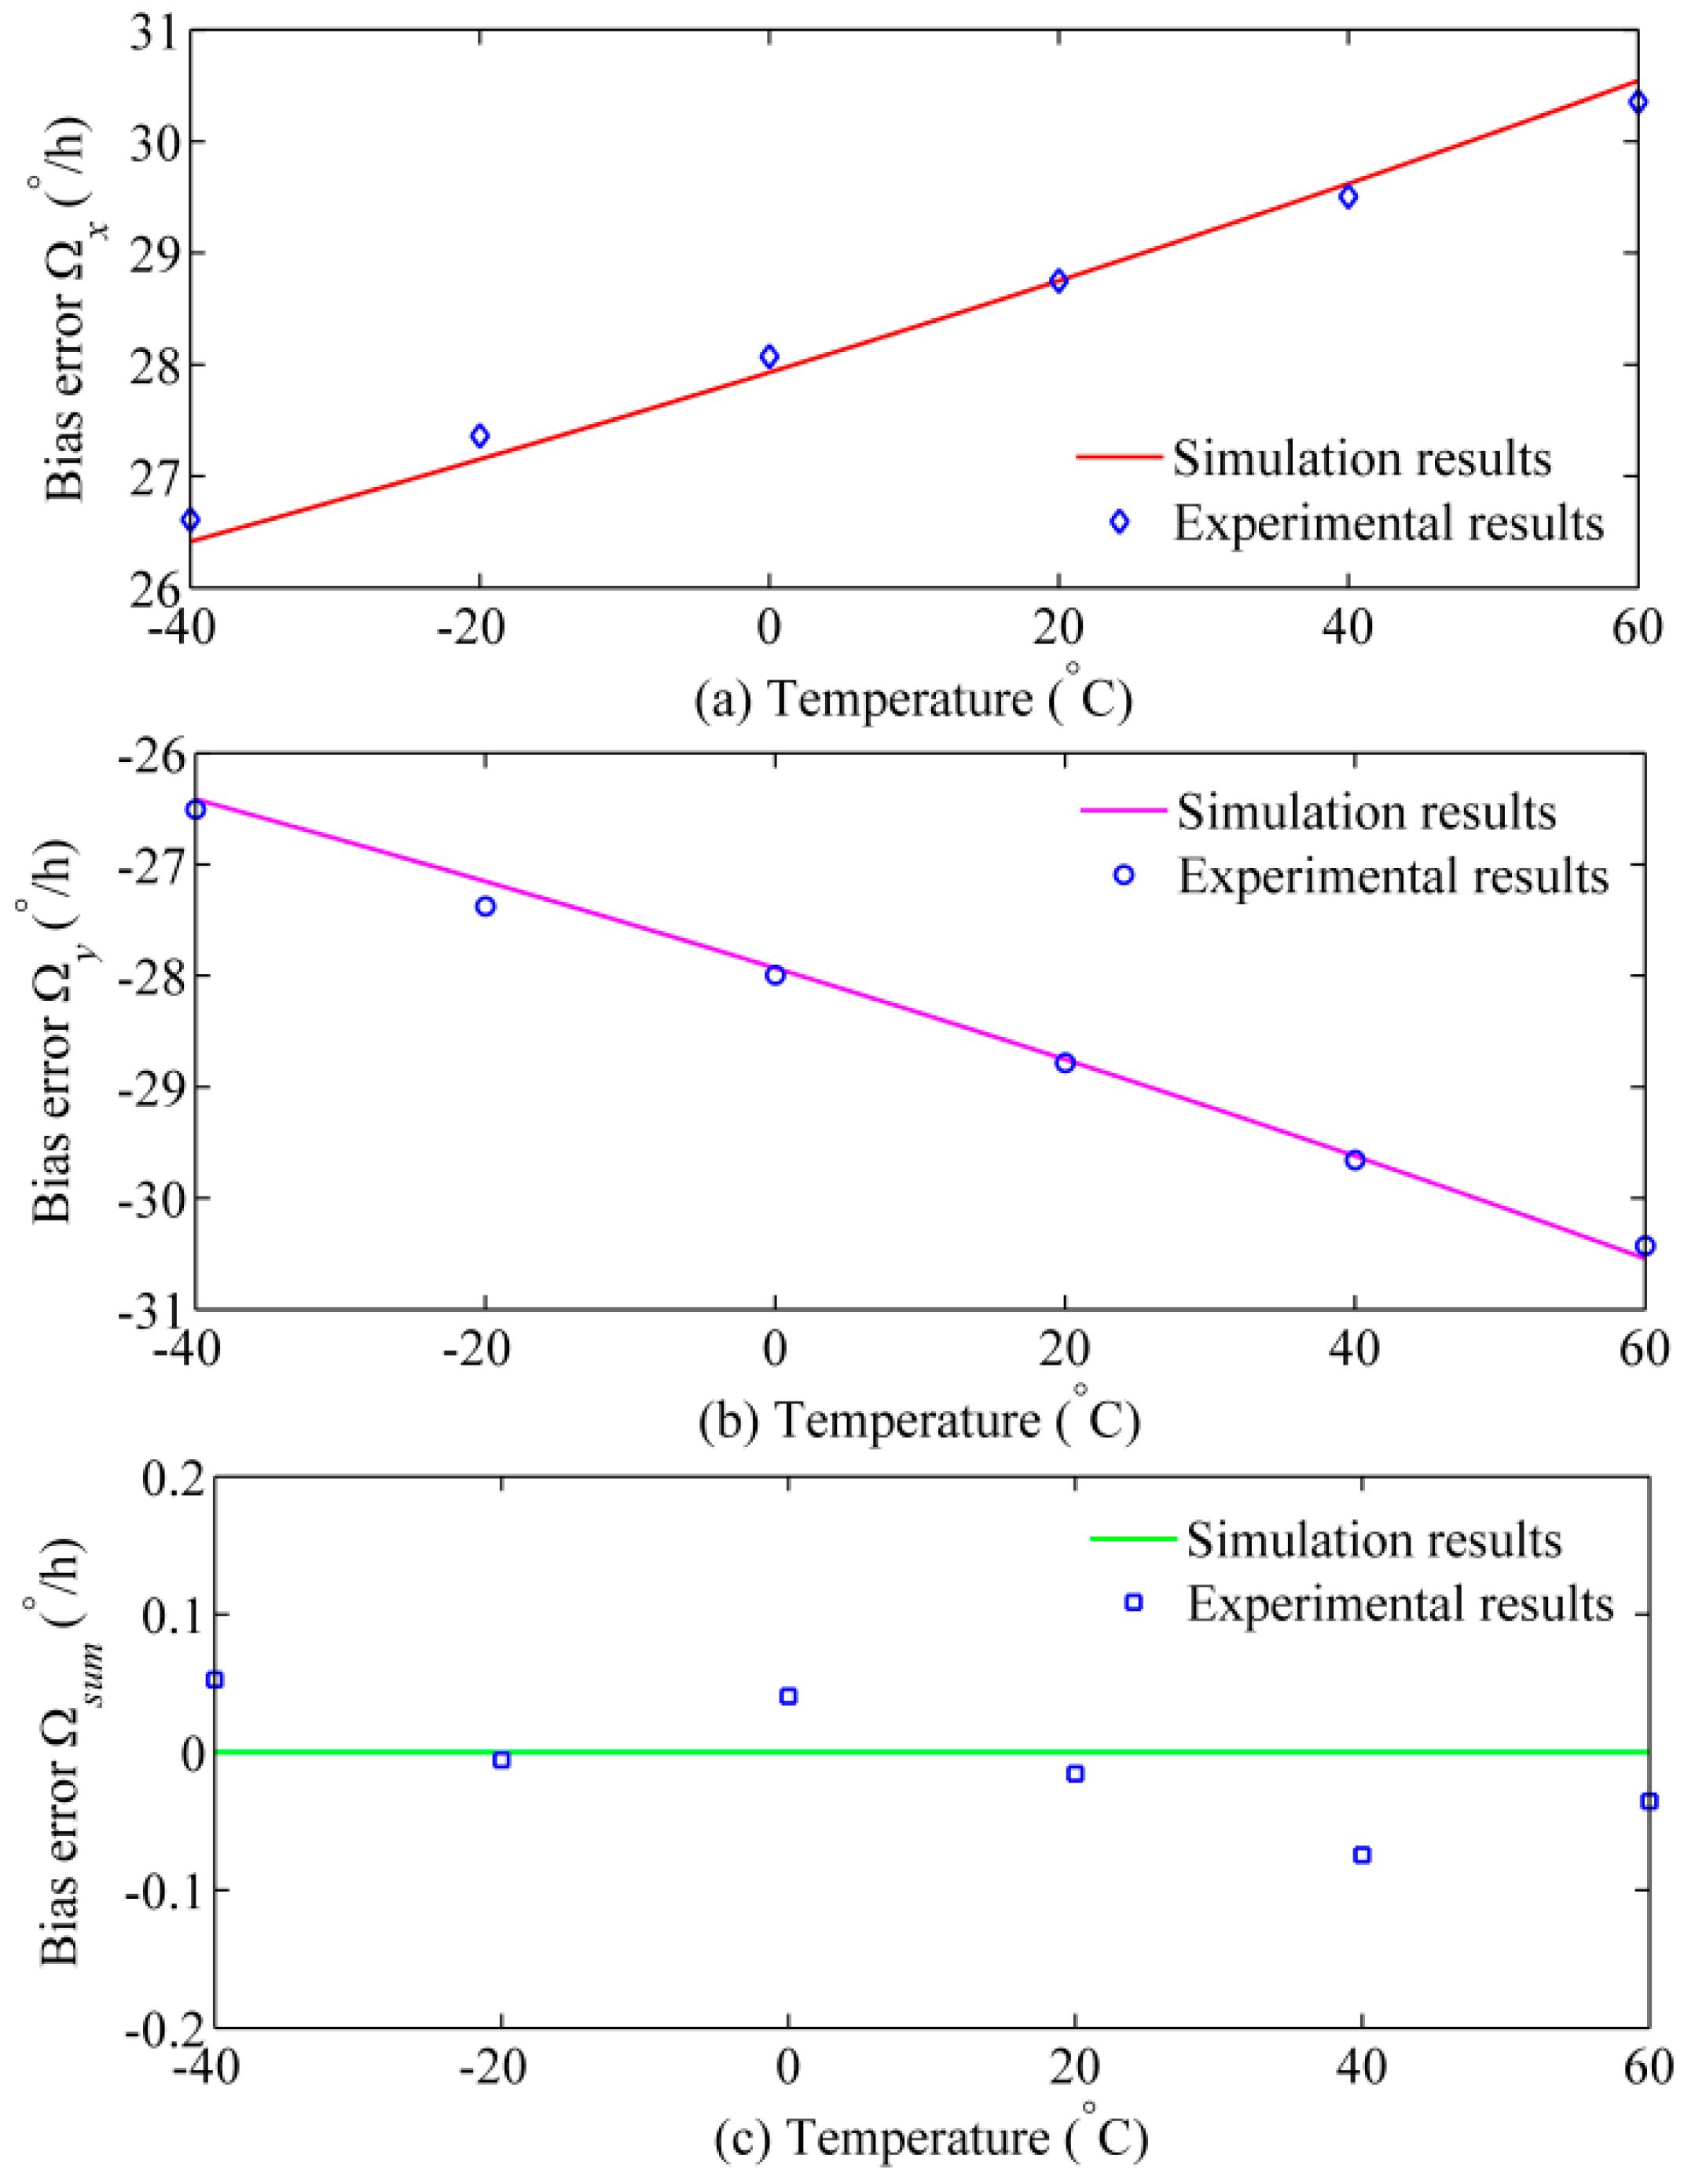 polarizer imperfect jones matrix